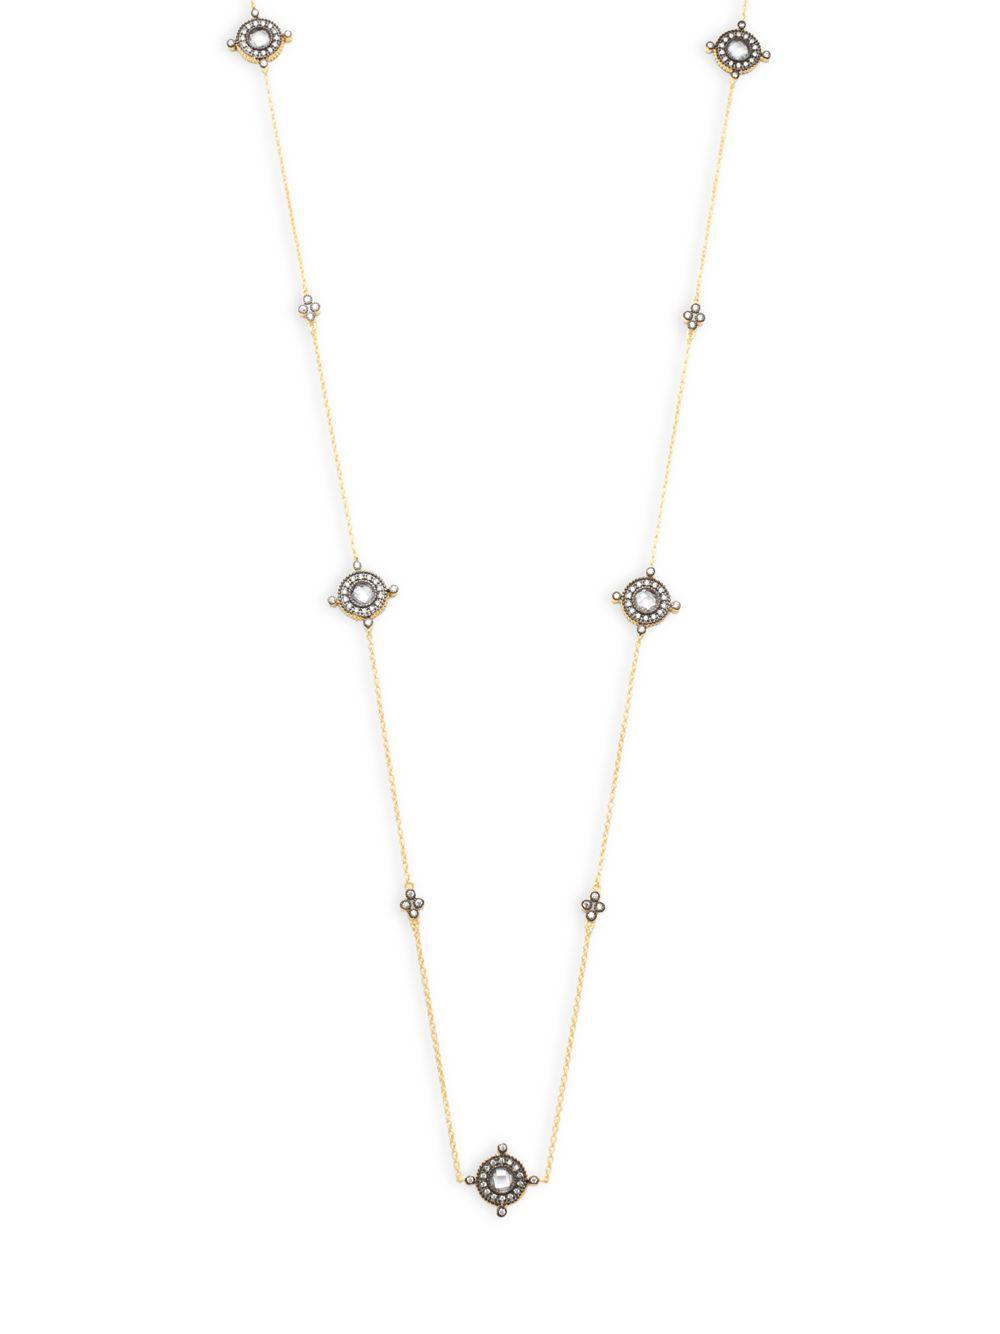 Freida Rothman Two Tone Mini Teardrop Station Wrap Necklace i6jNpWPn33